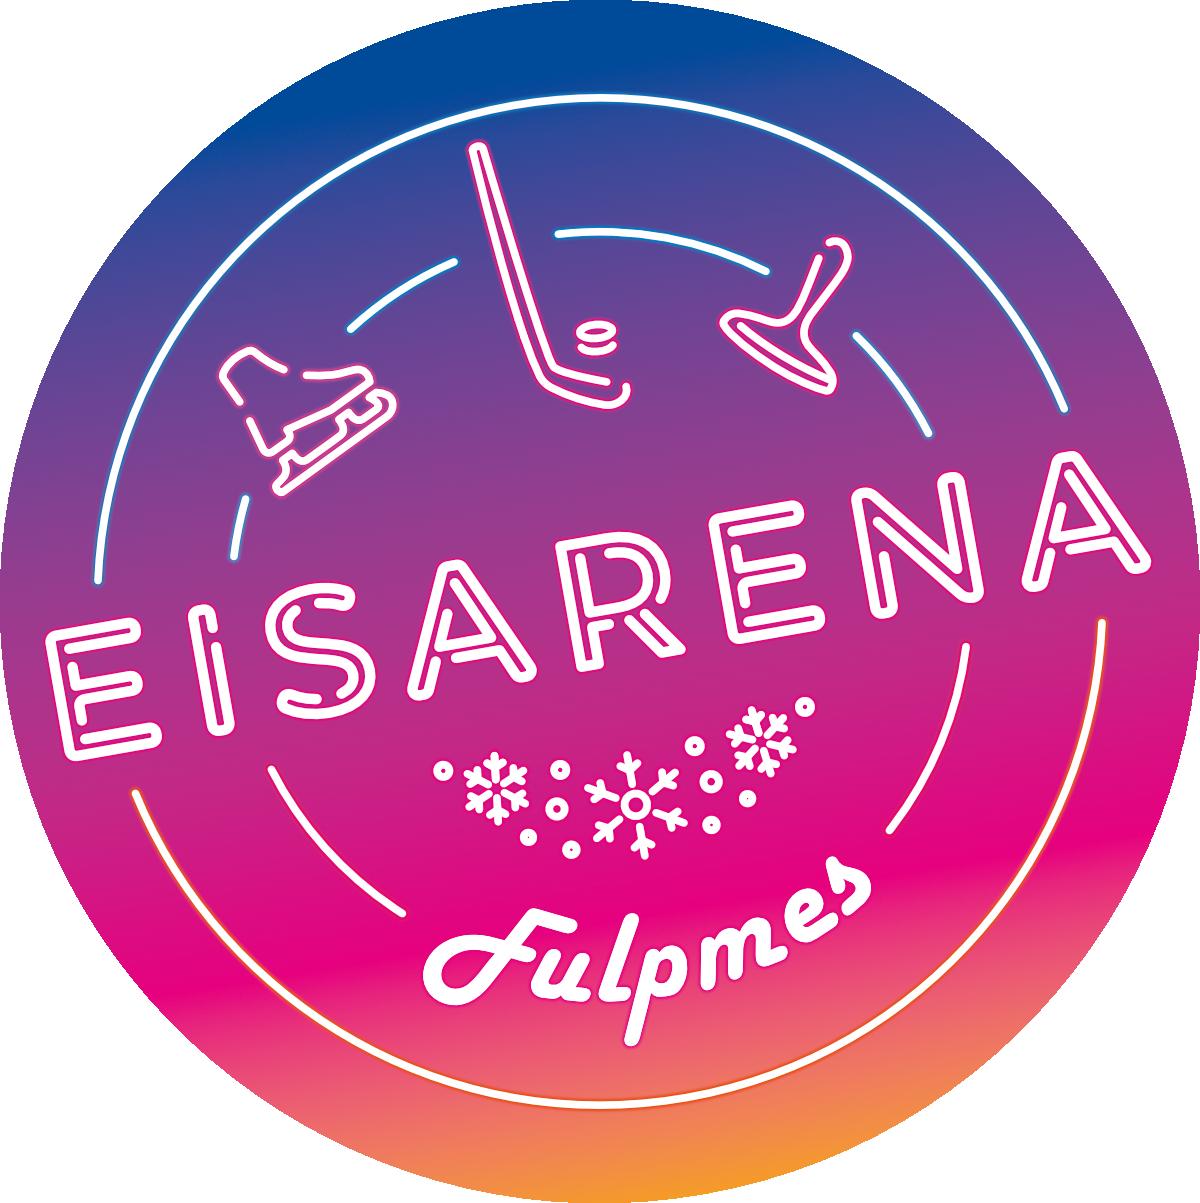 Eisarena Fulpmes